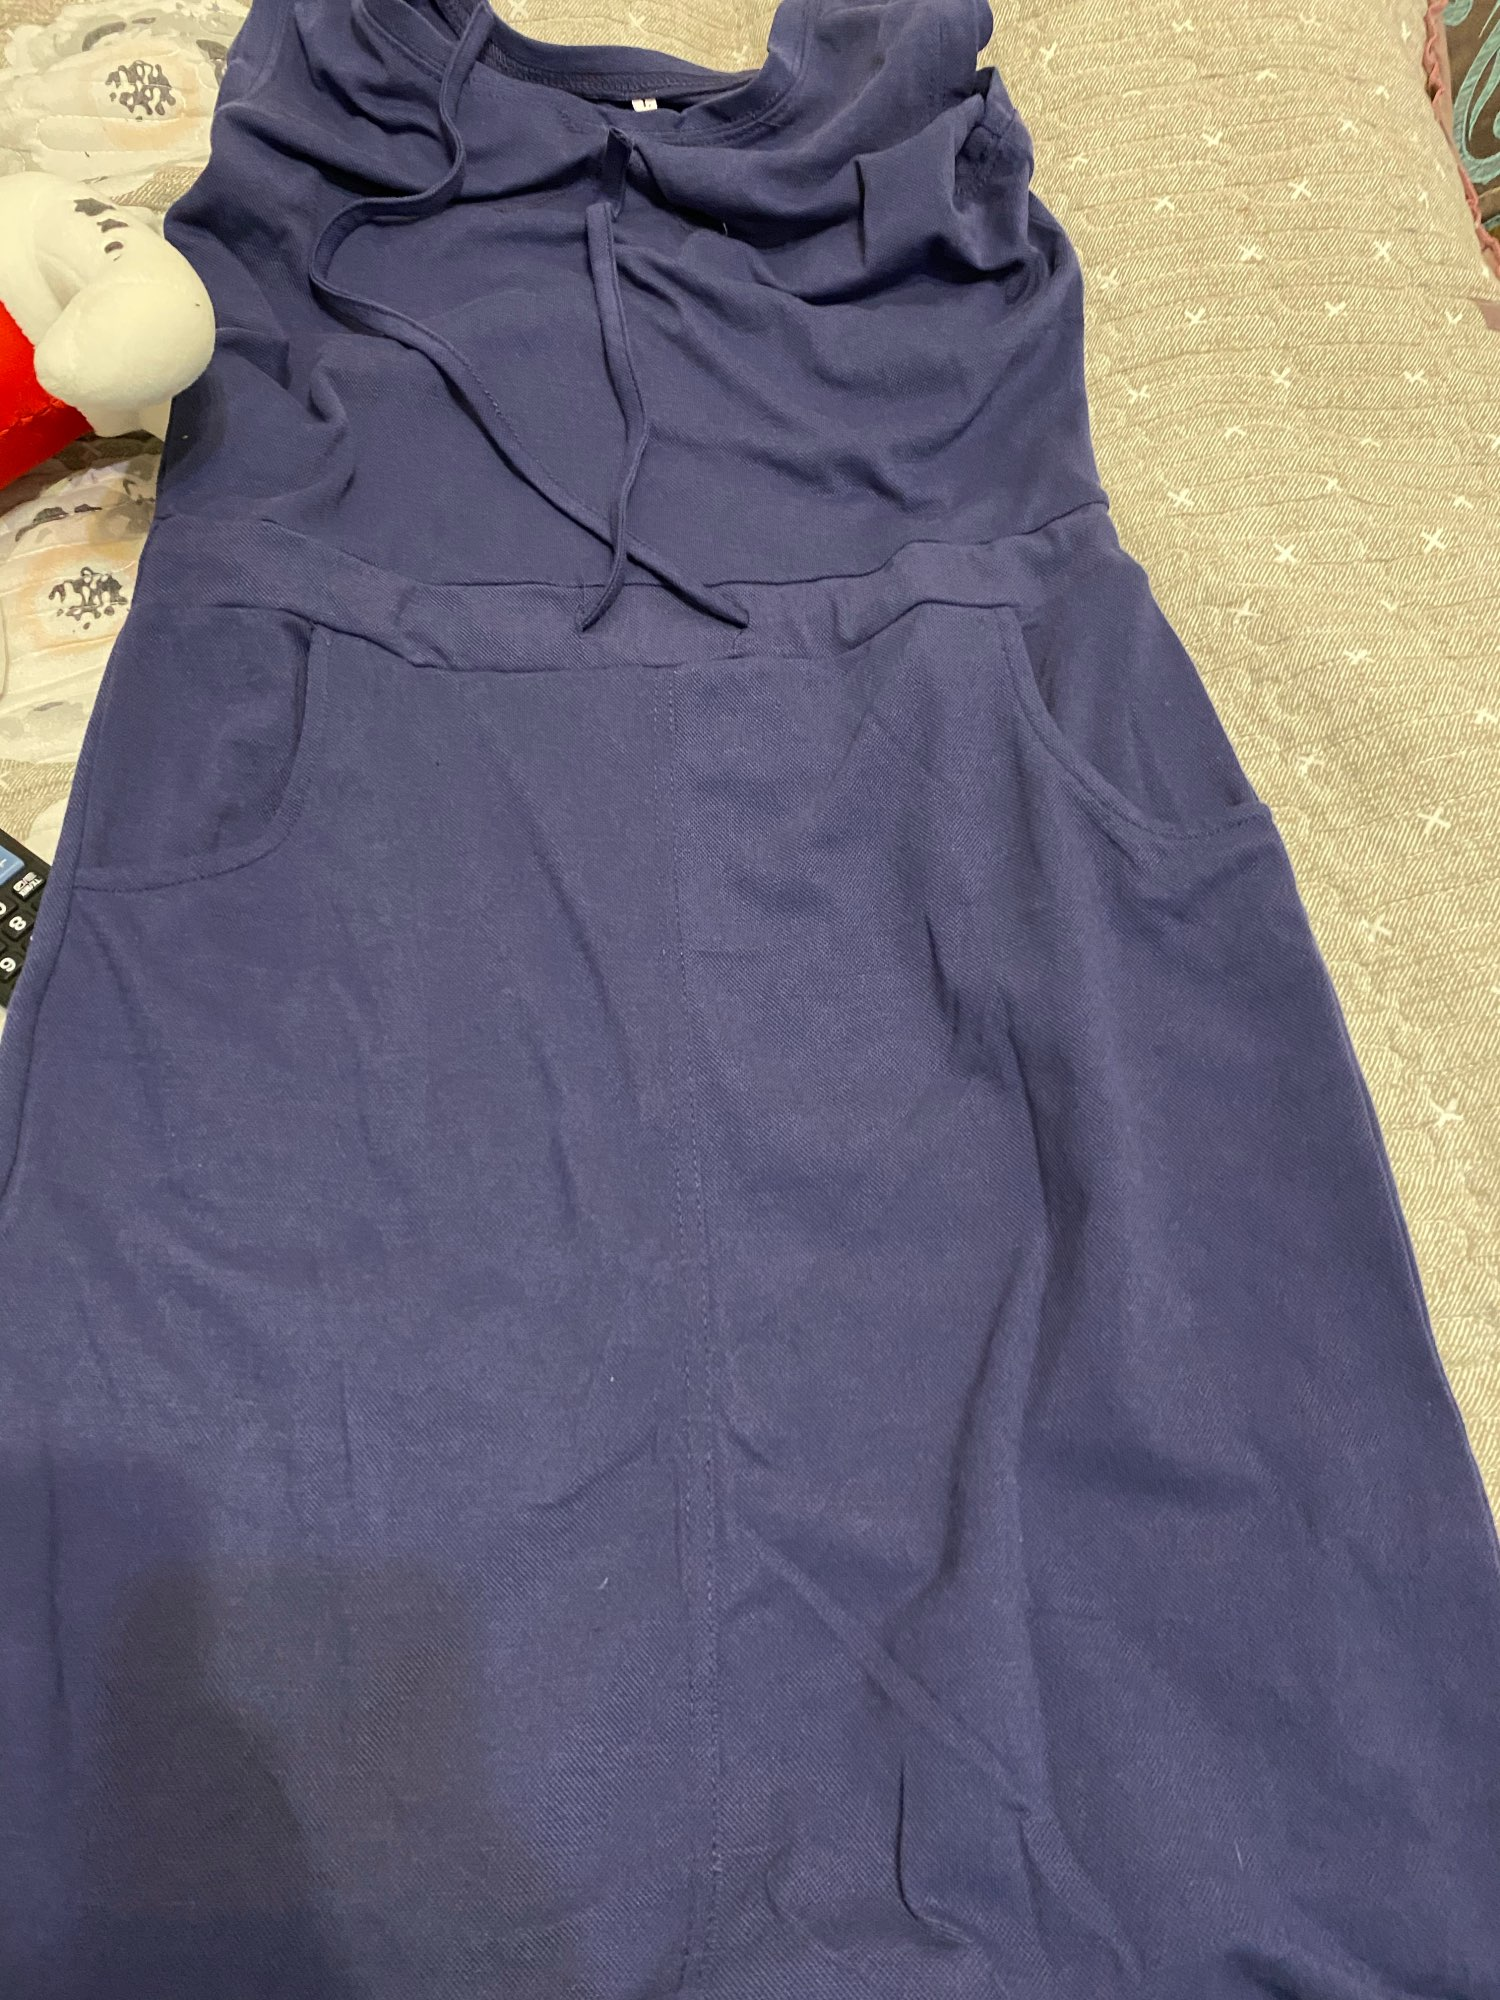 Elegant Party Summer Women Dress Fashion Slim Fit Pockets Pencil Dresses Work Sleeveless Sexy Casual Dress Robe Femme J2218|summer dress|sexy dressvestidos fashion - AliExpress